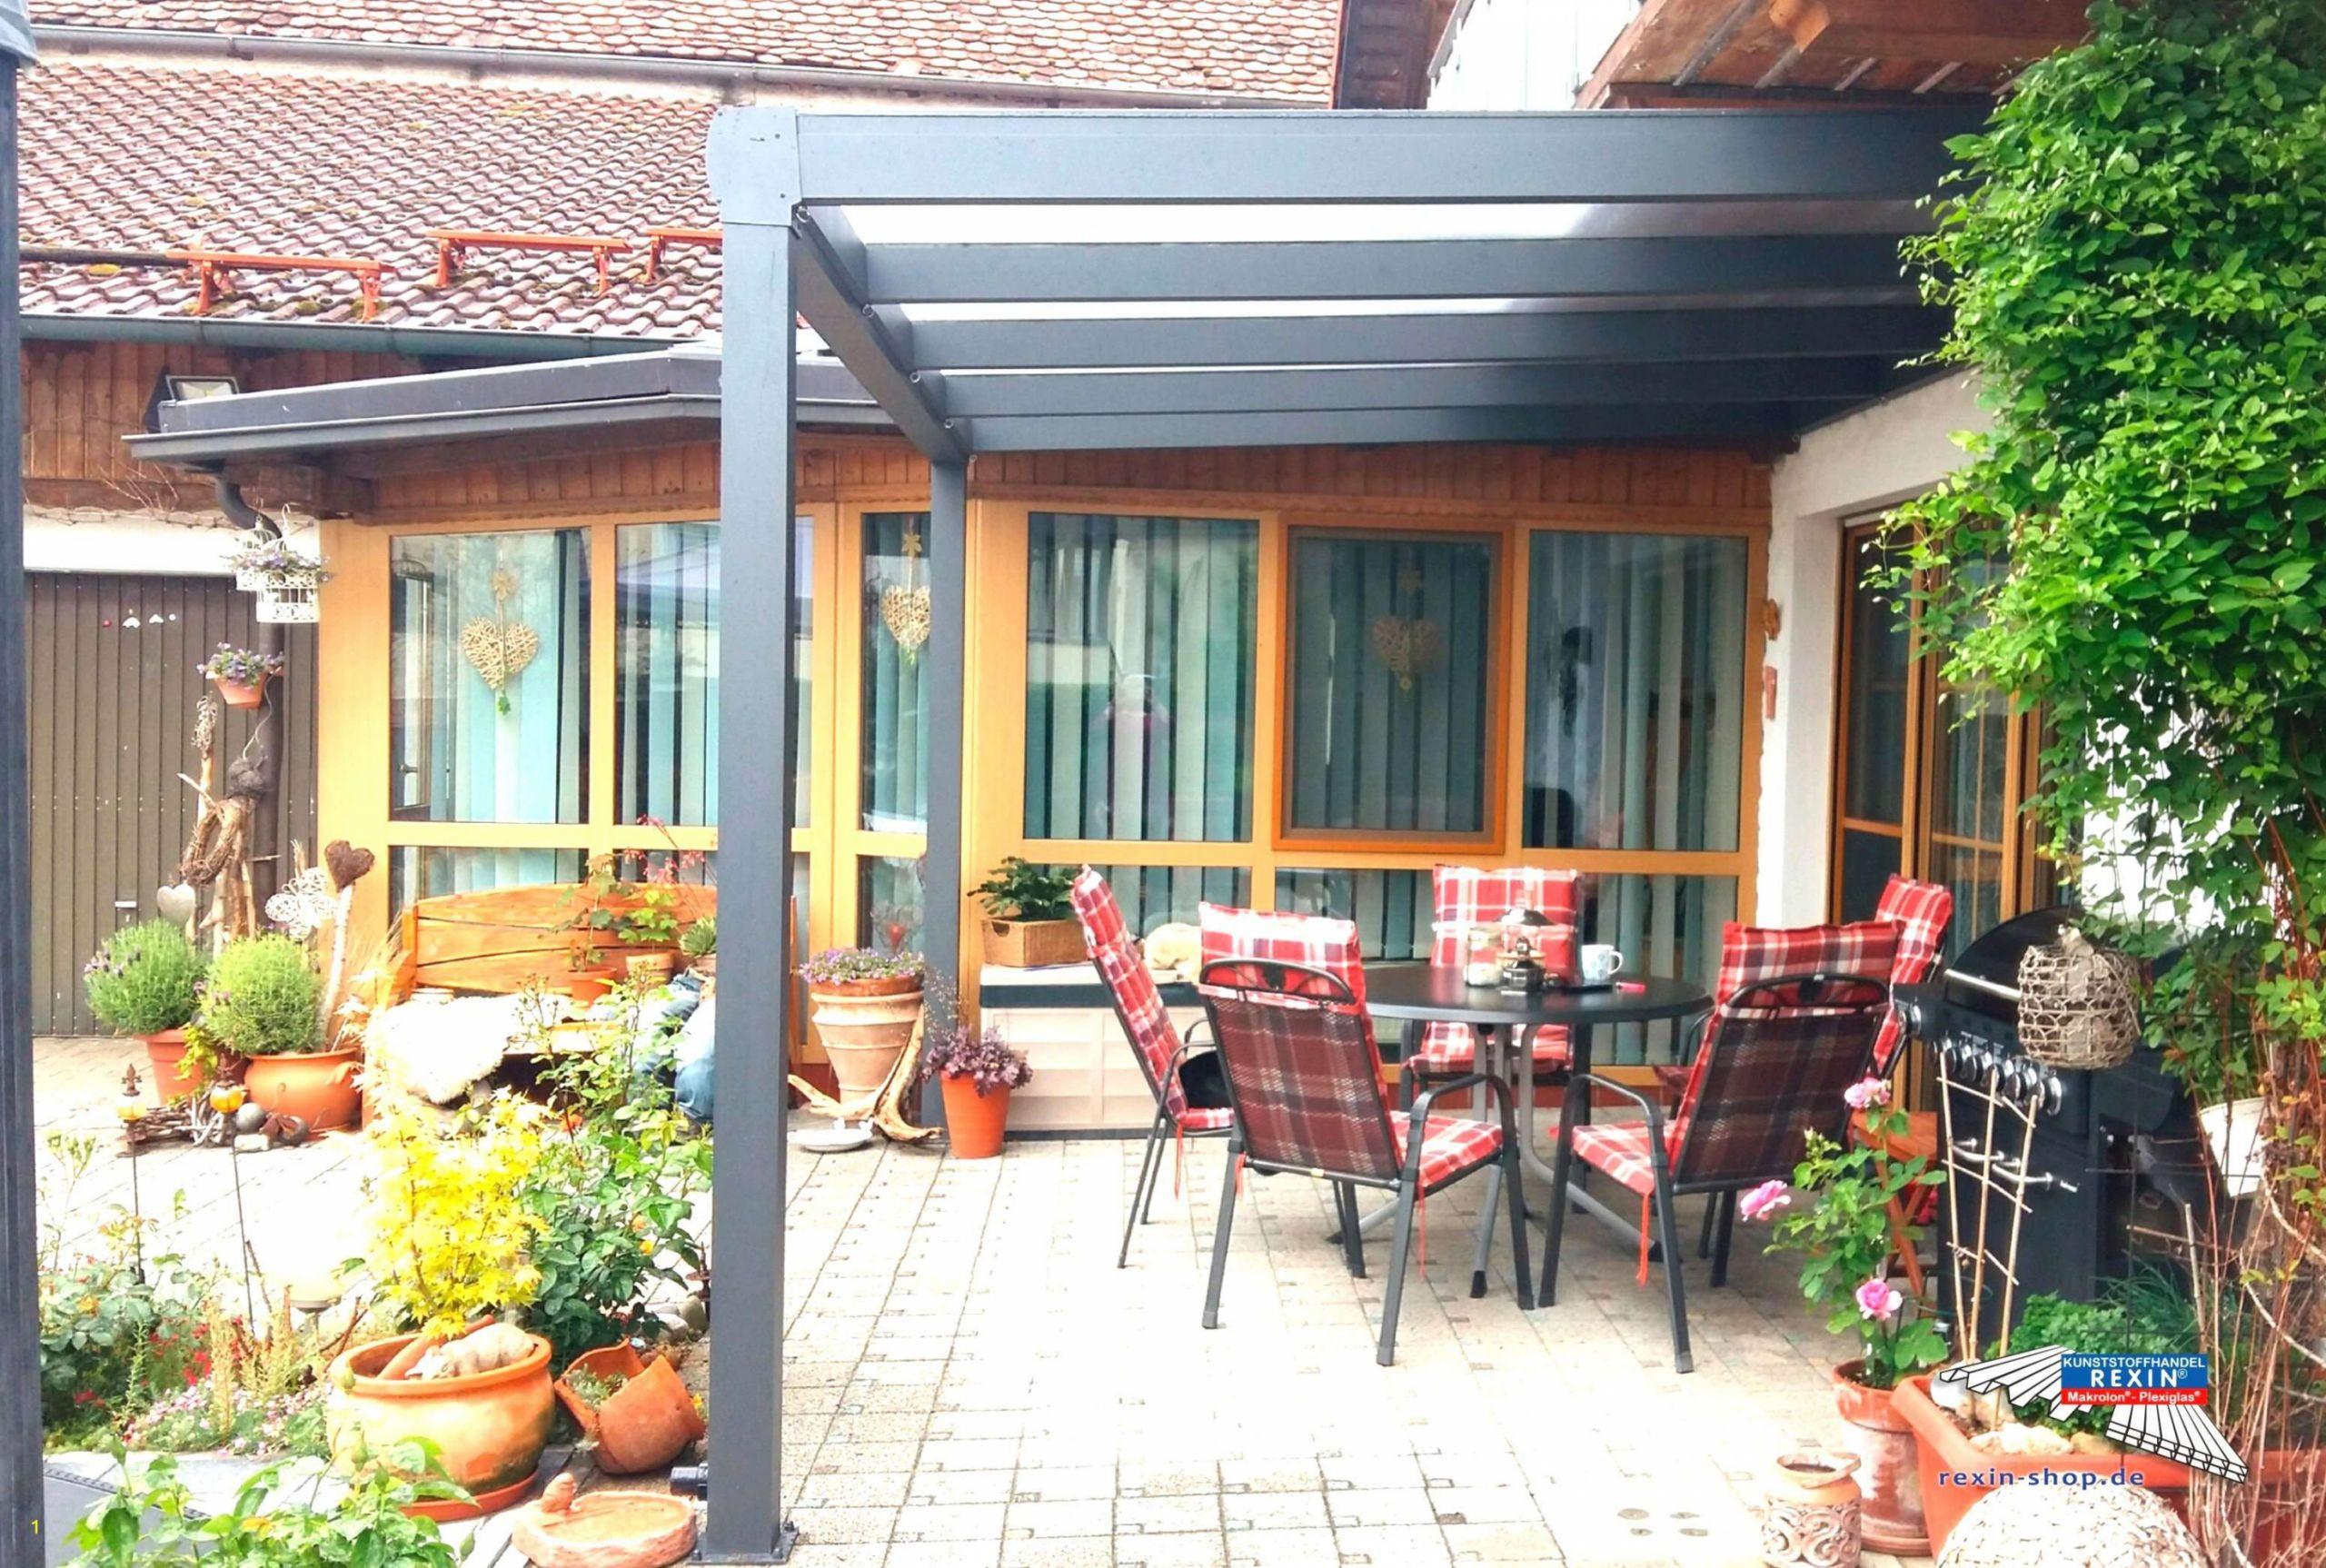 Beet Deko Frisch Terrasse Am Hang — Temobardz Home Blog